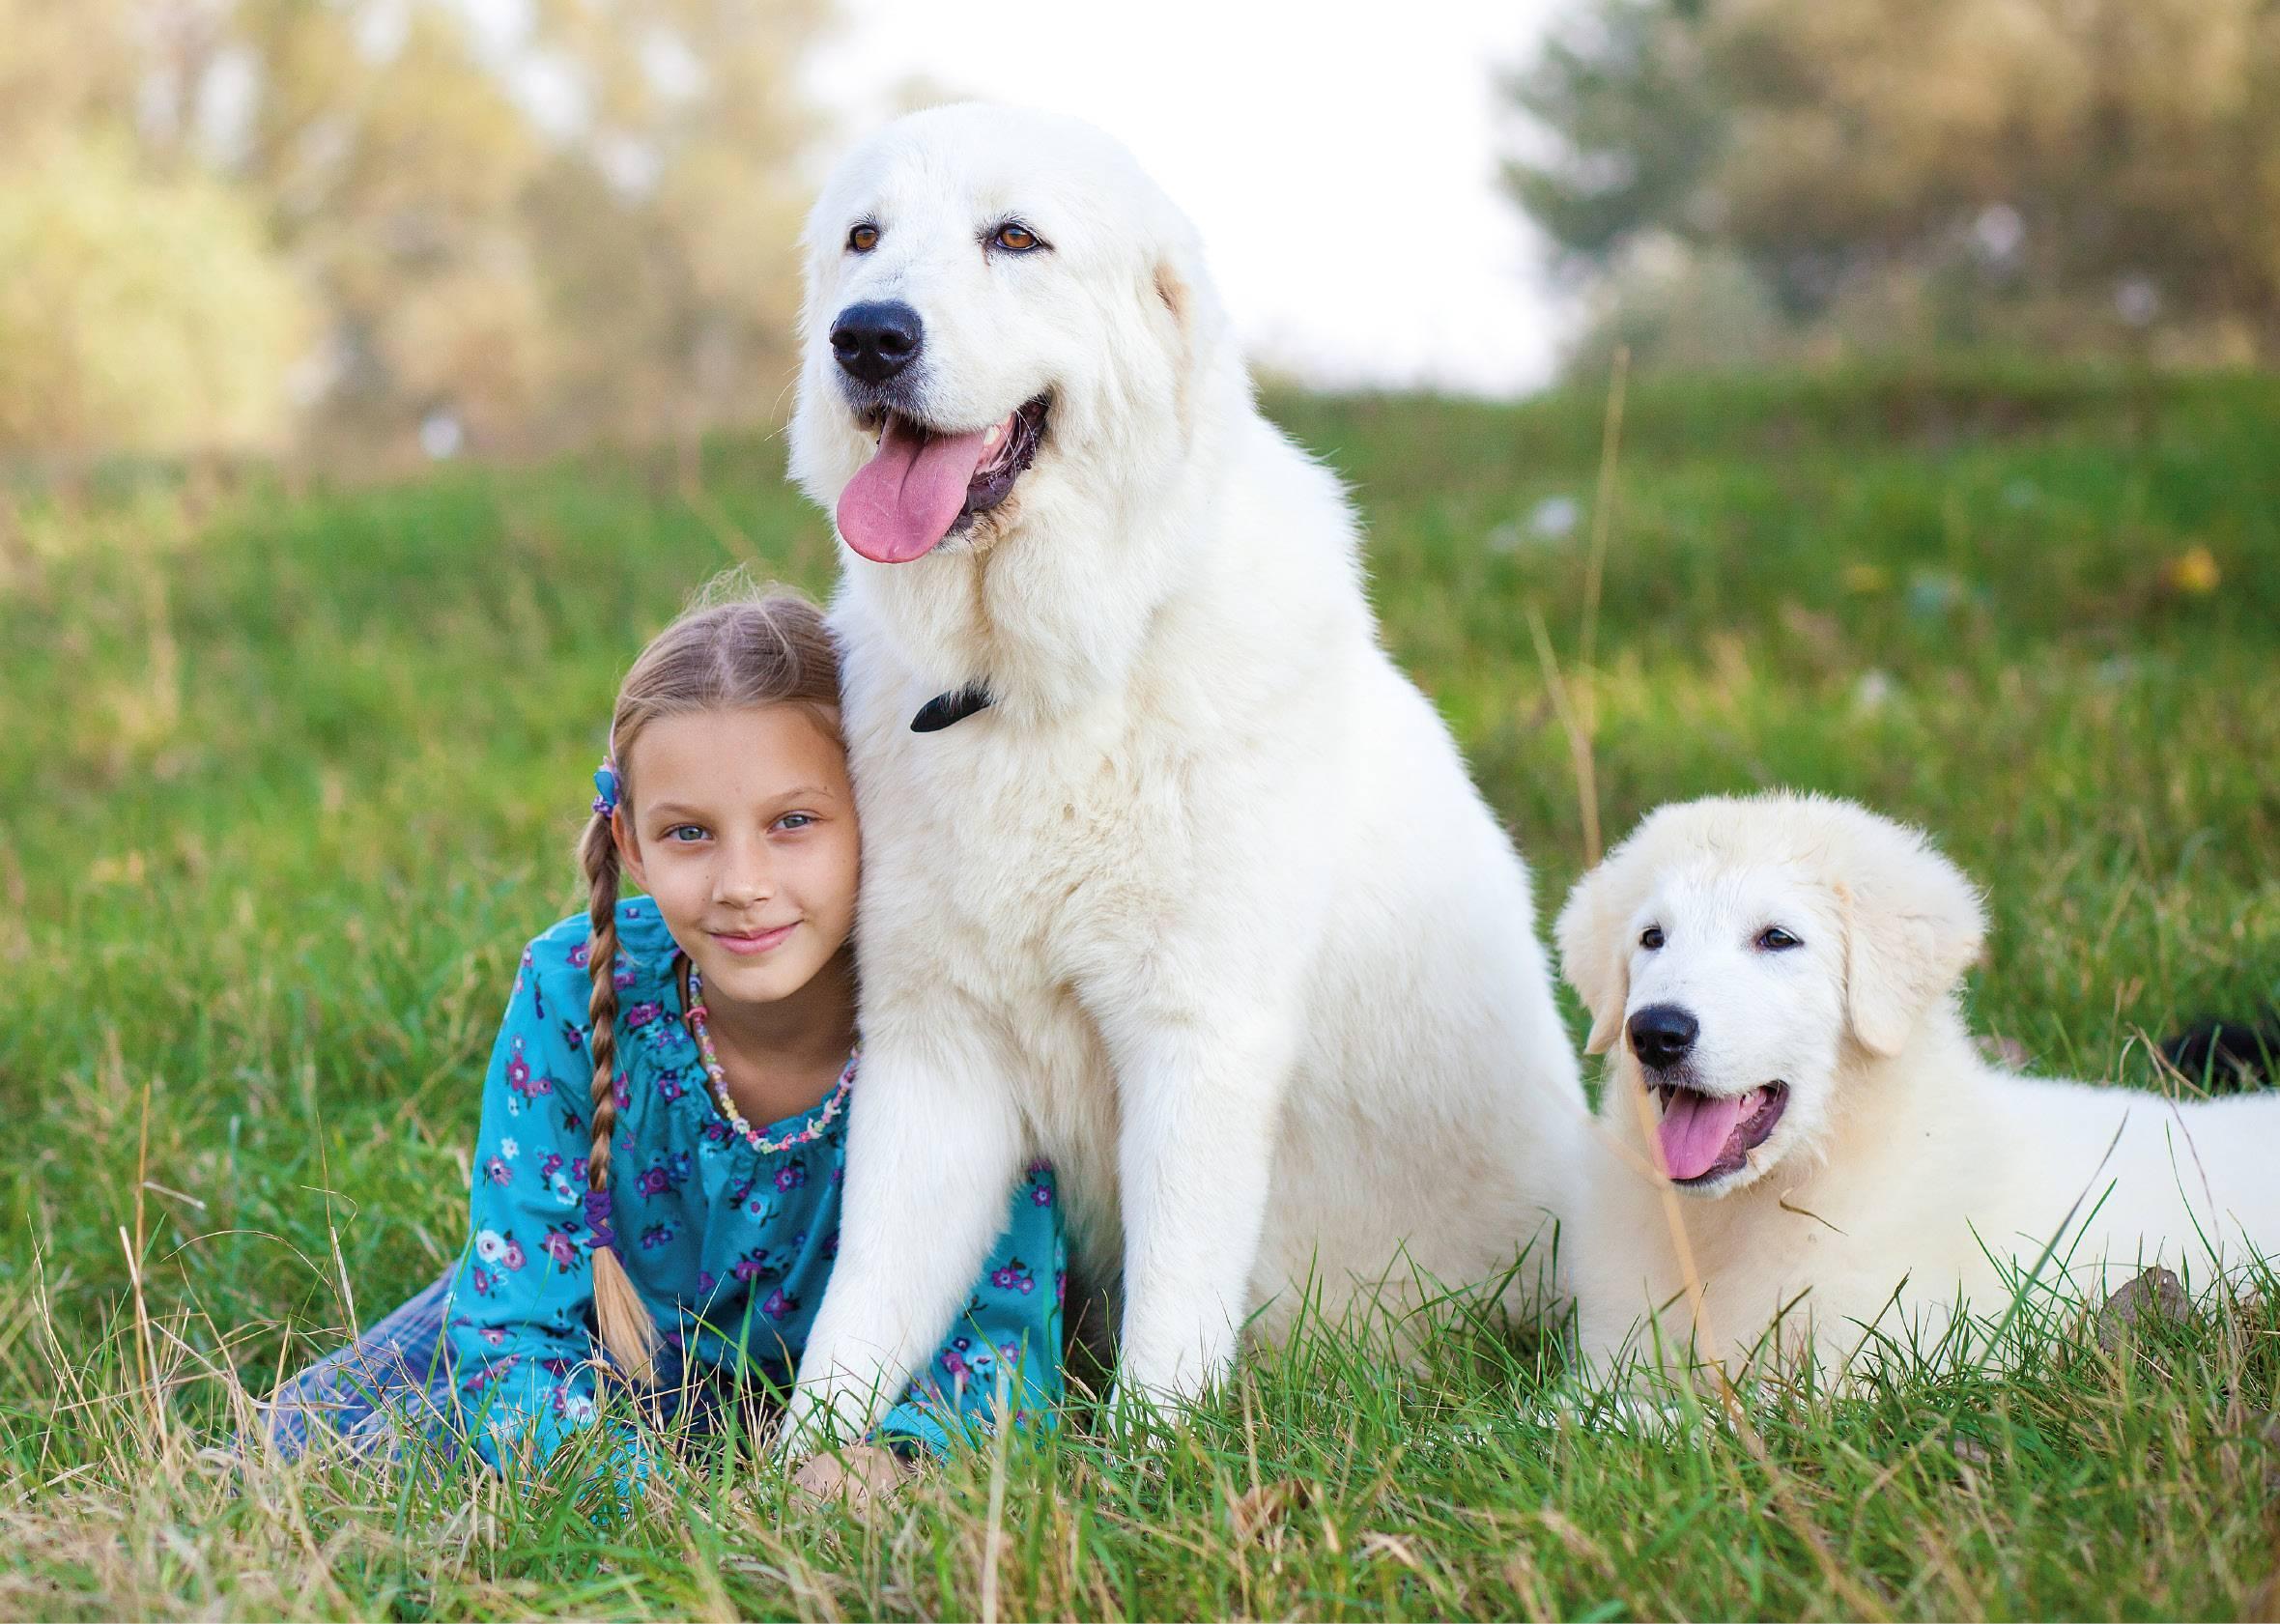 Мареммо-абруцкая овчарка: фото собаки маремма, характер и экстерьер породы собак